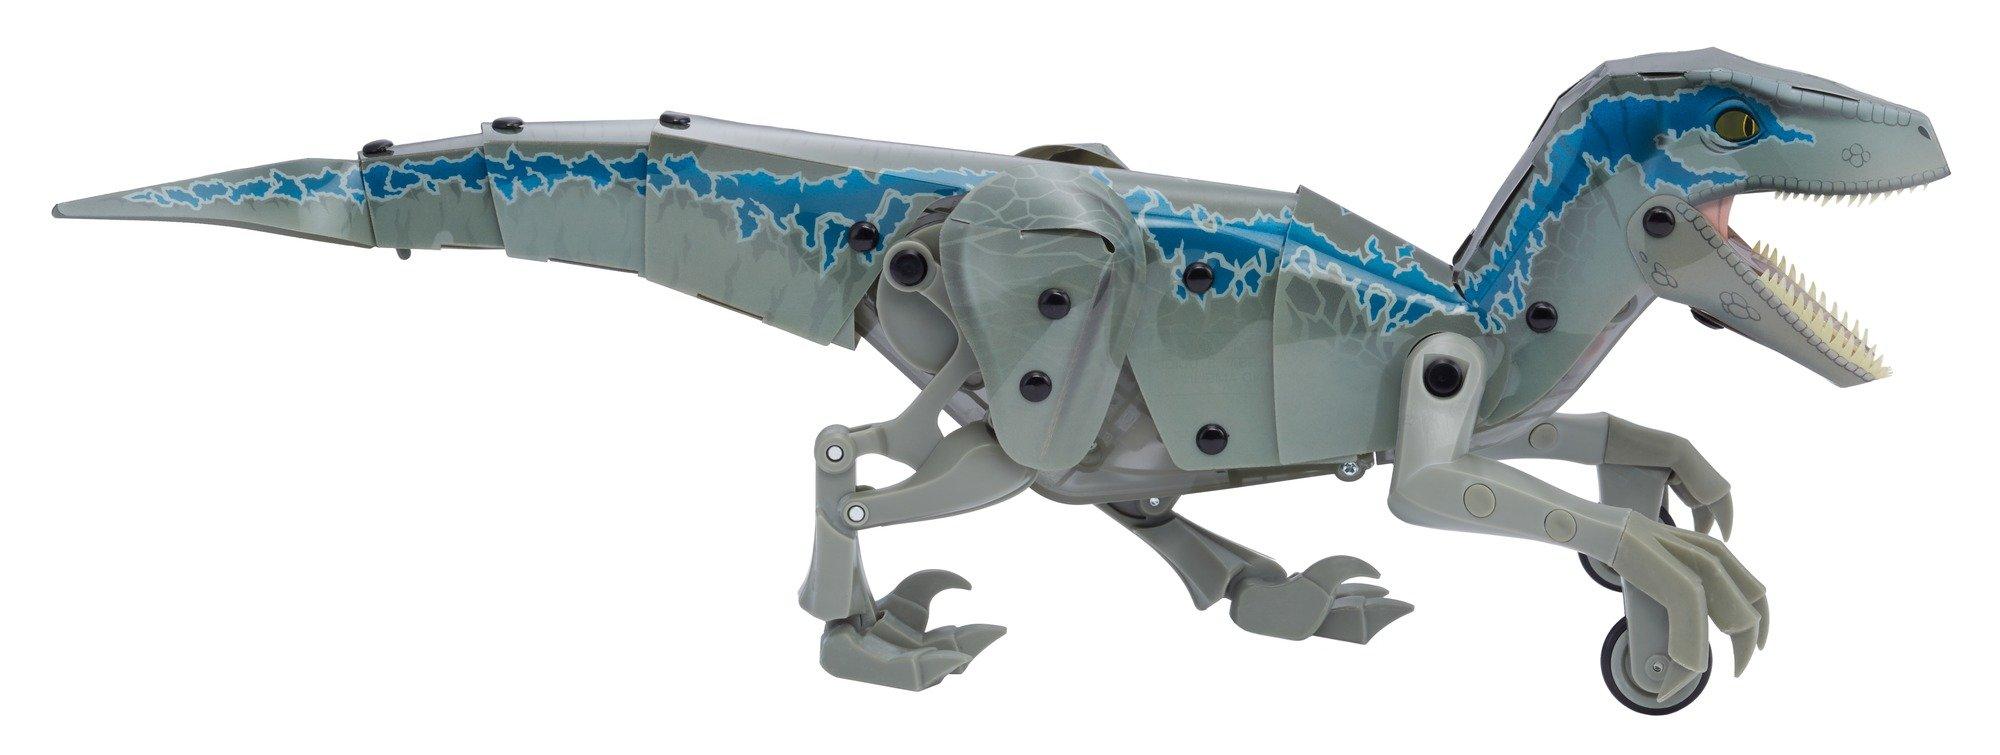 Kamigami Jurassic World Blue Robot by Jurassic World Toys (Image #11)